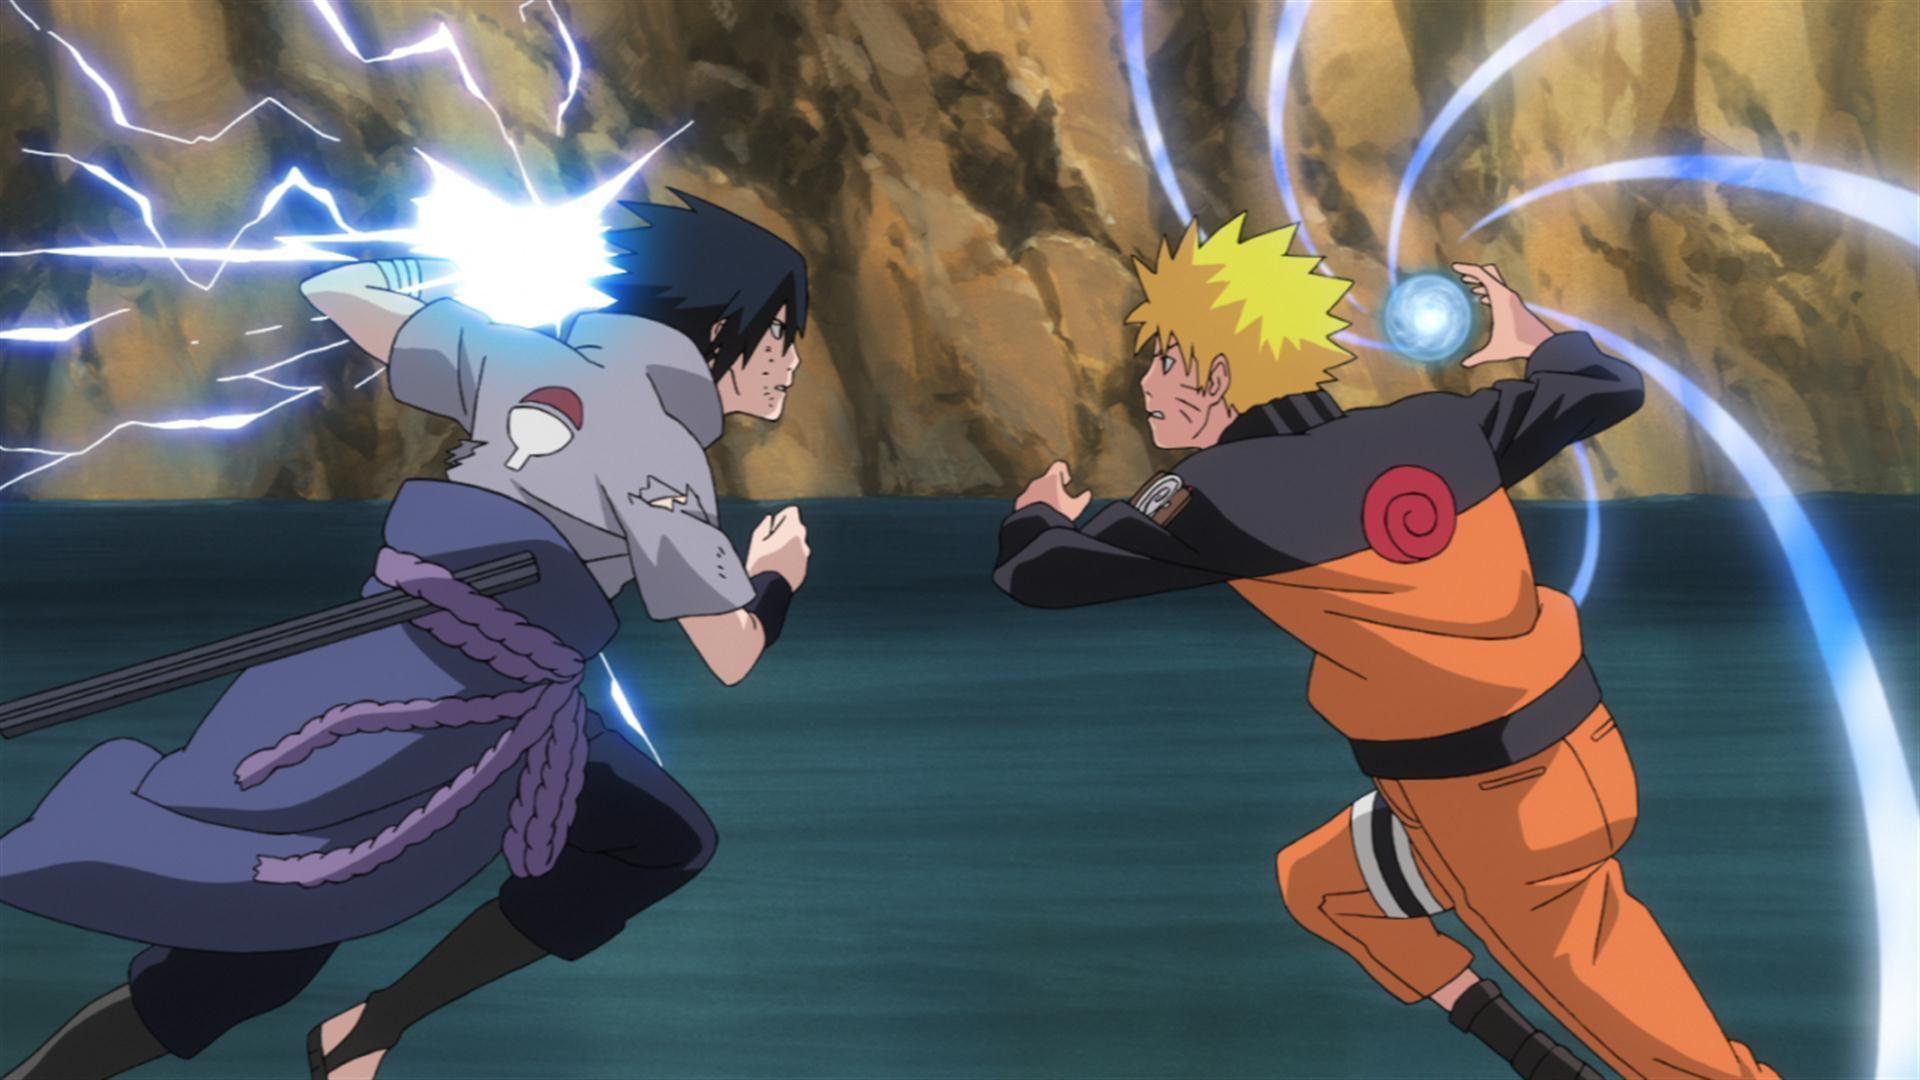 Naruto Vs Sasuke 4k Pictures » Cinema Wallpaper 1080p